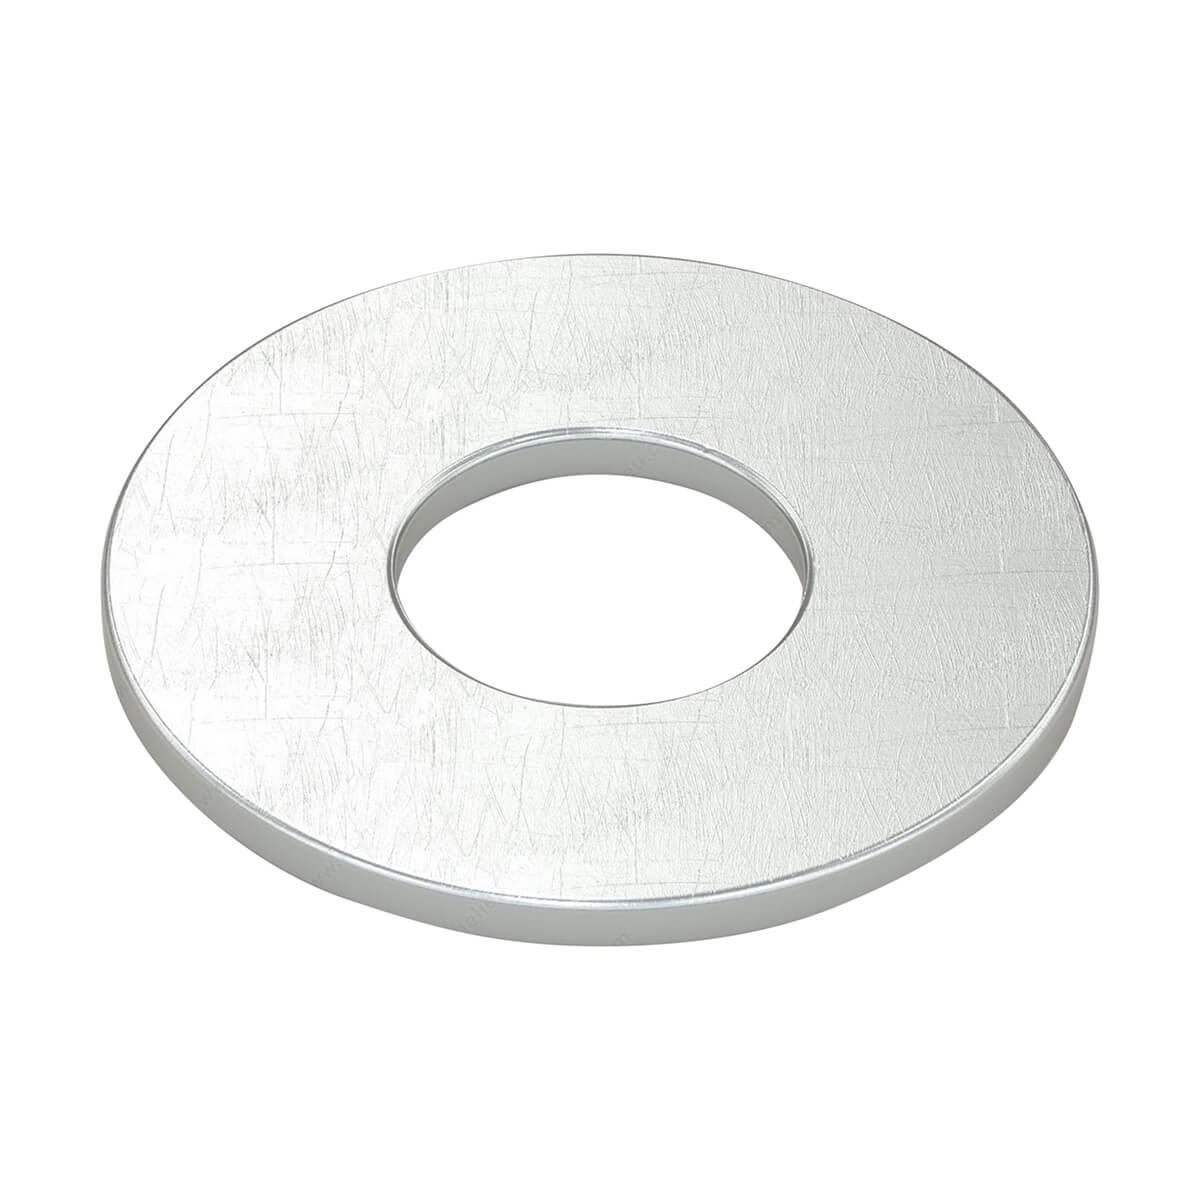 Flat Washers - Steel - 1/4-in - 16 / Box